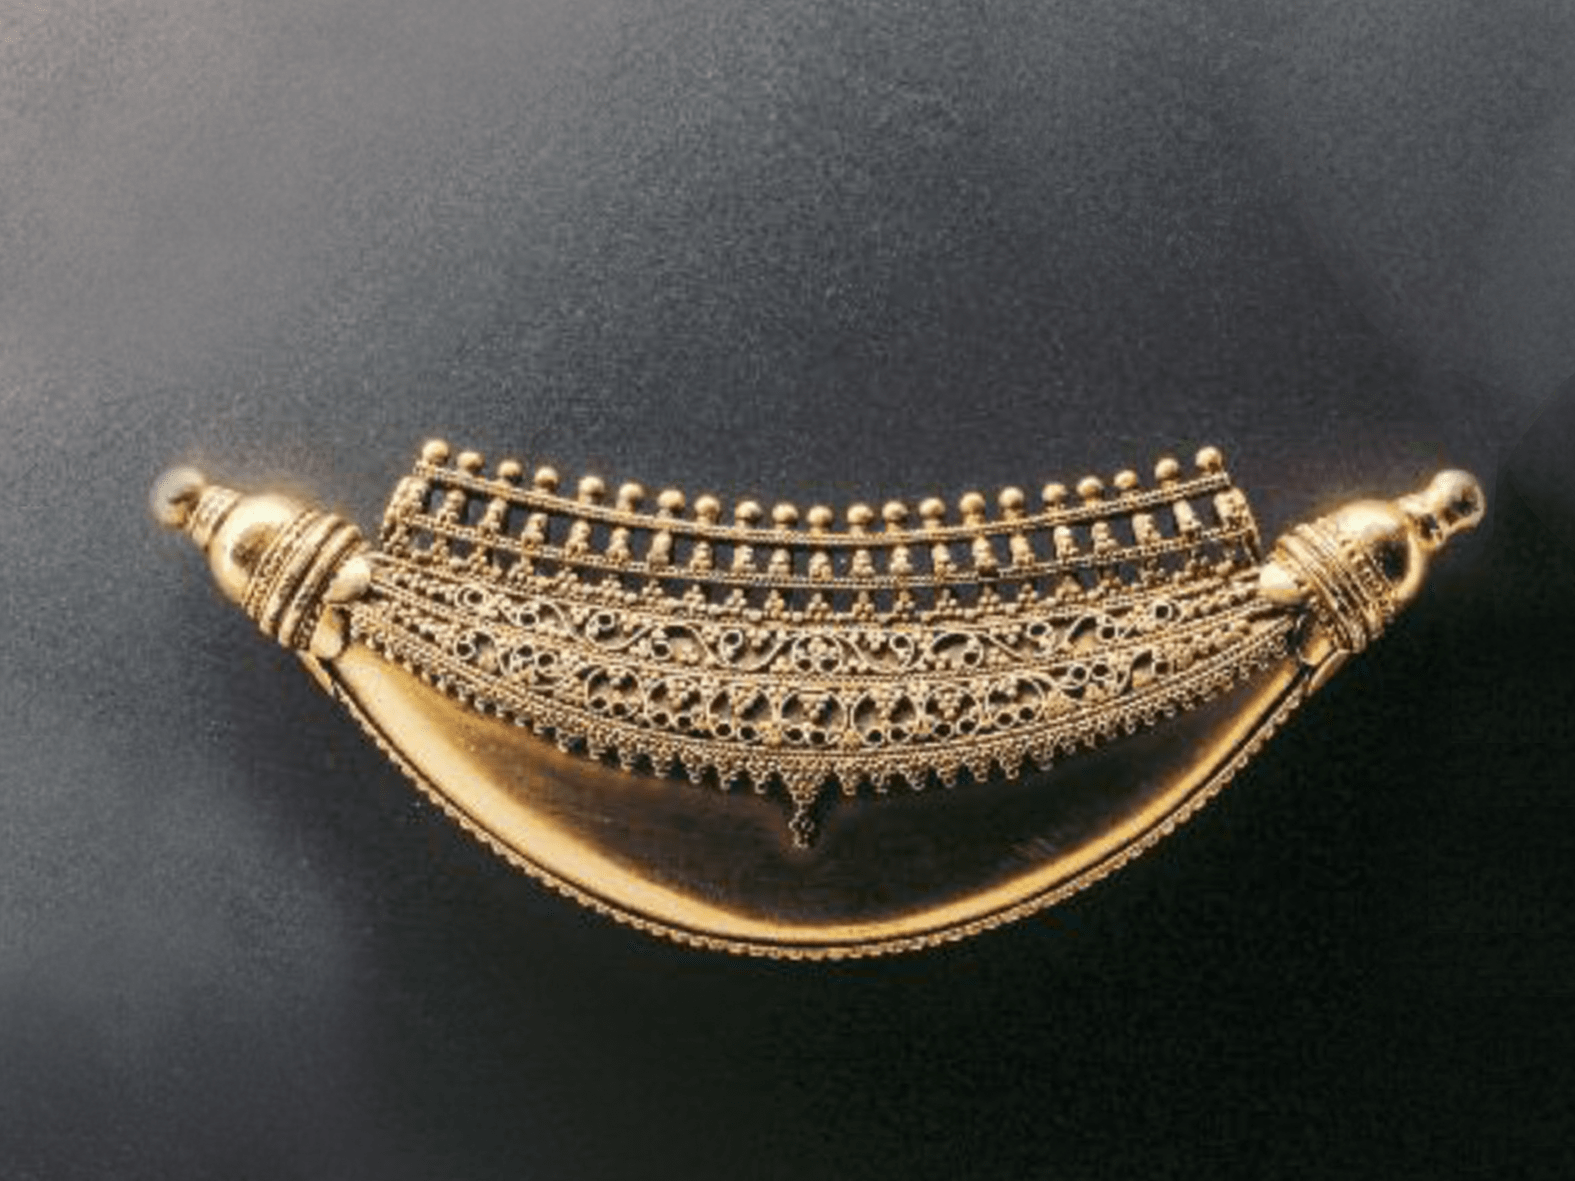 .... Kokke thathi pendant, Karnataka, 20th century ..Pendentif kokke thathi, Karnataka, XXe siècle ....